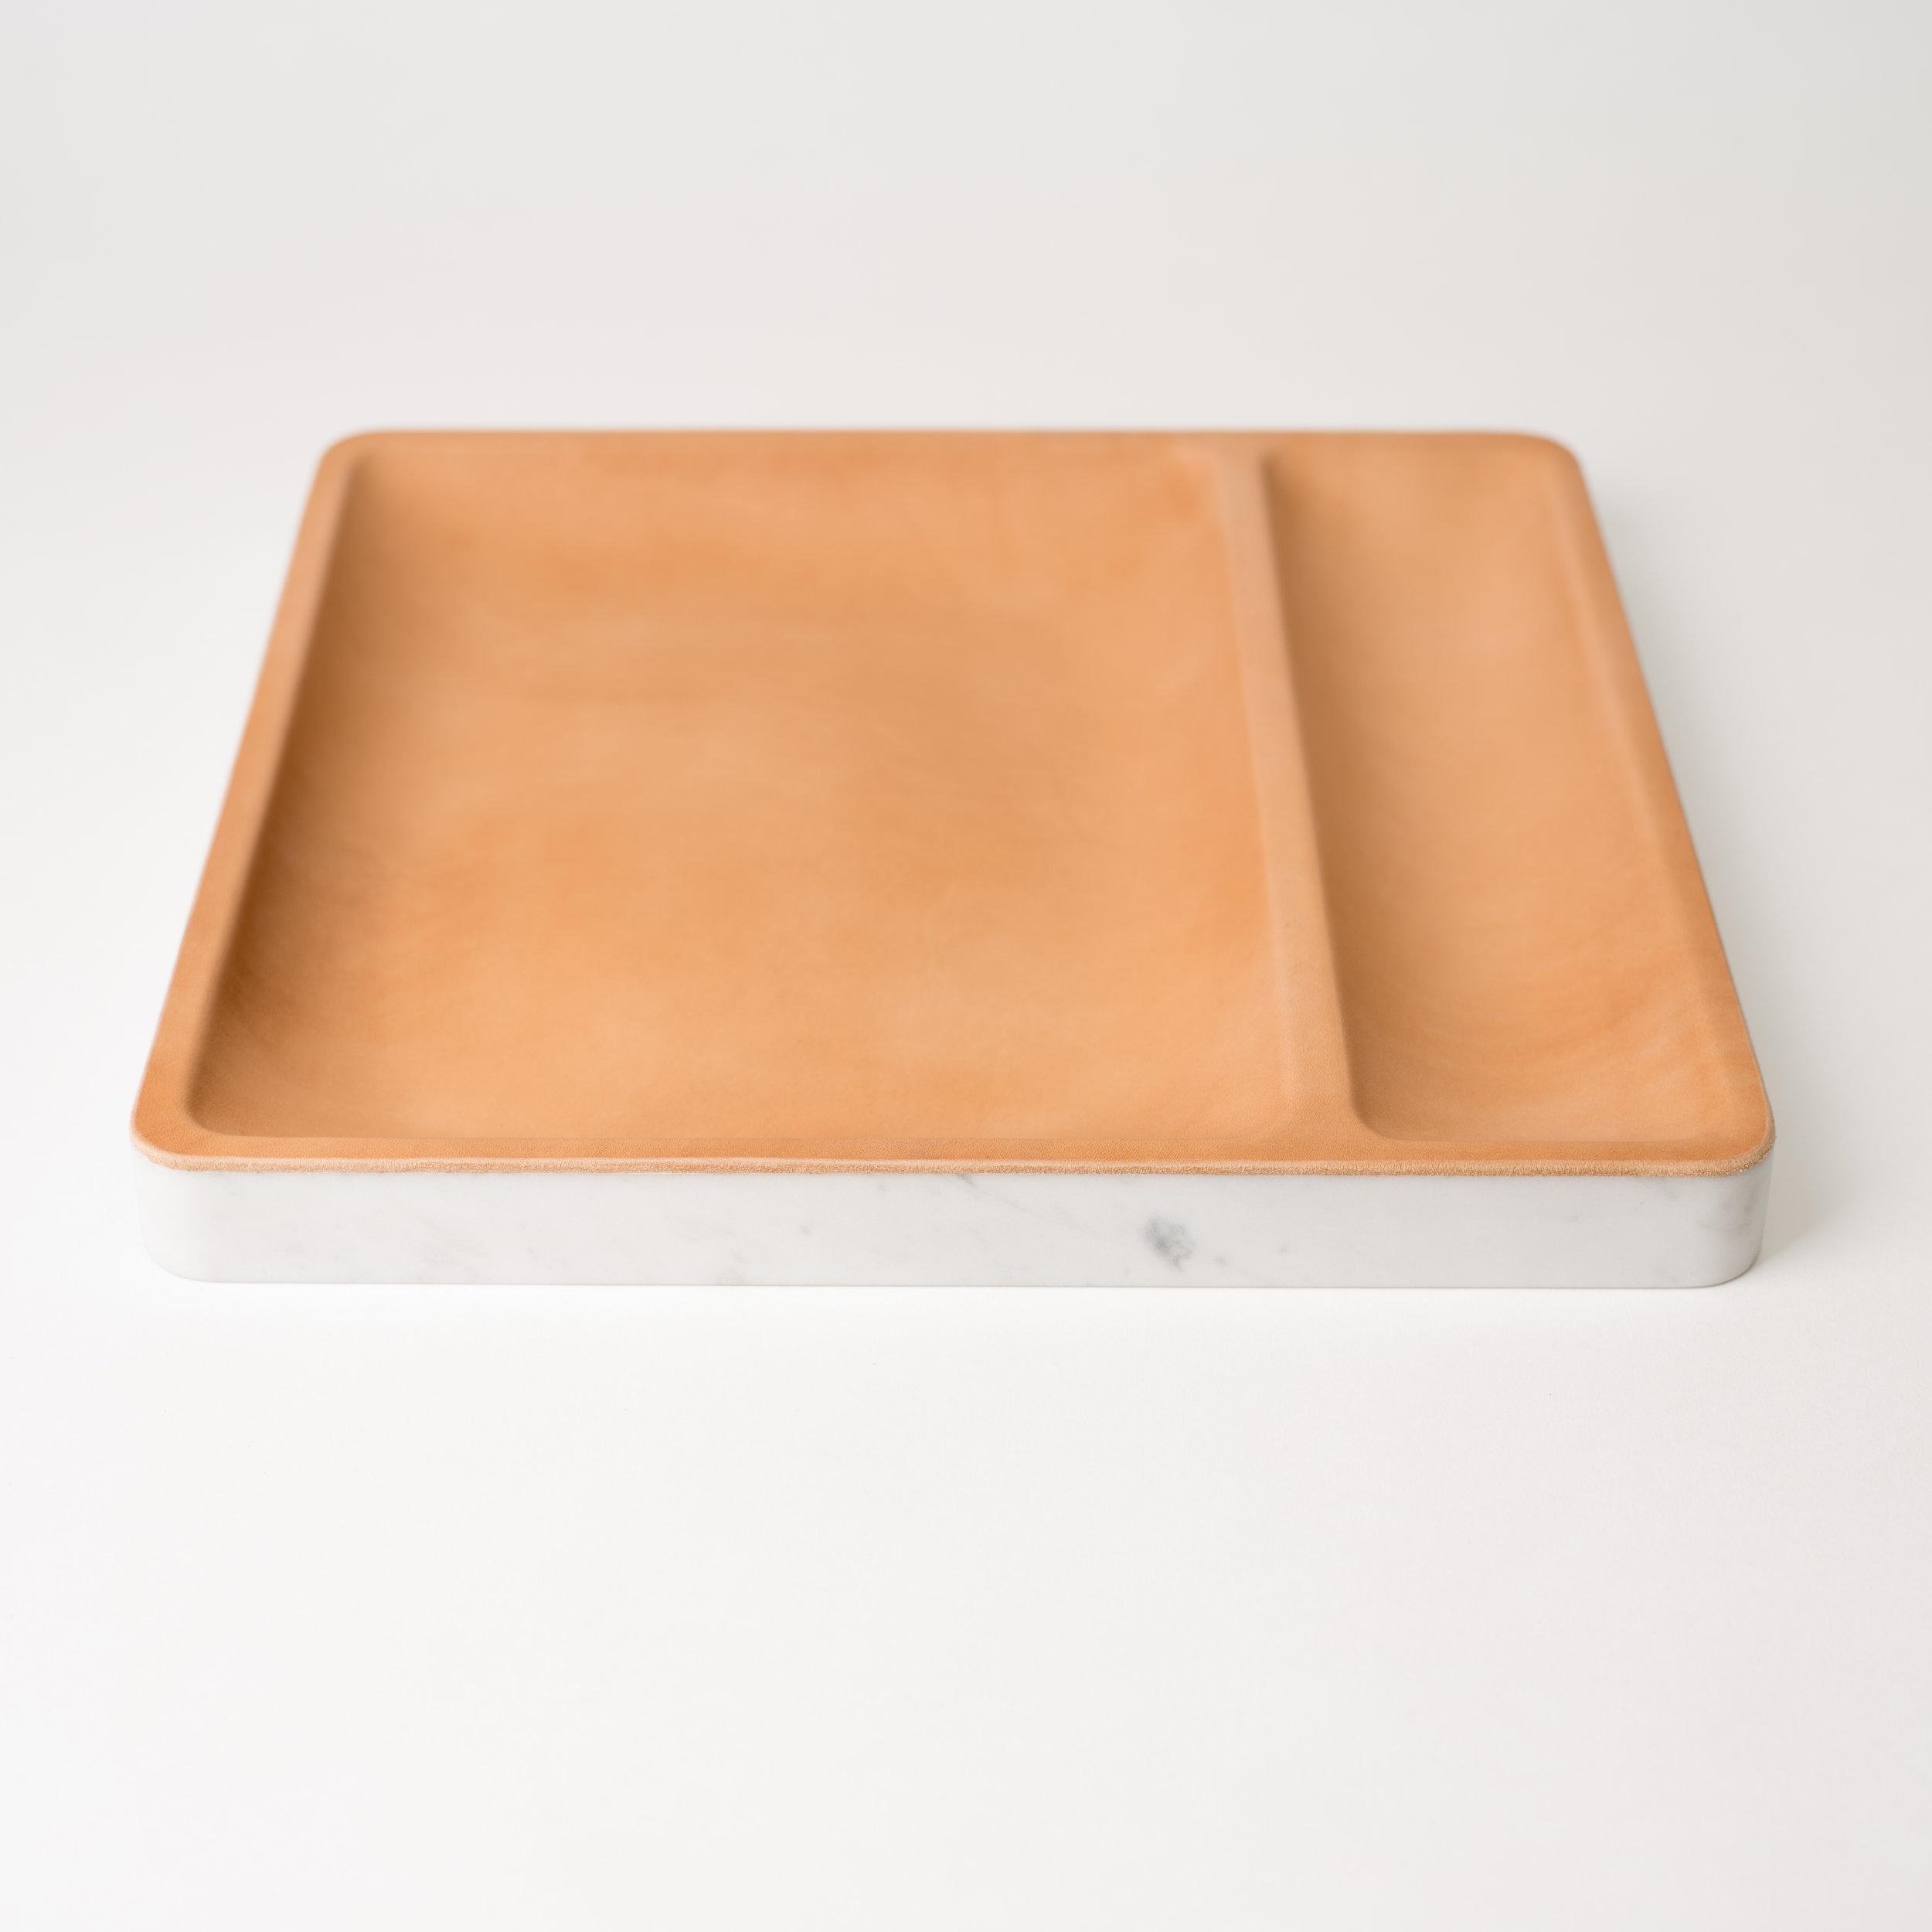 new trays oct 5th-1299.jpg